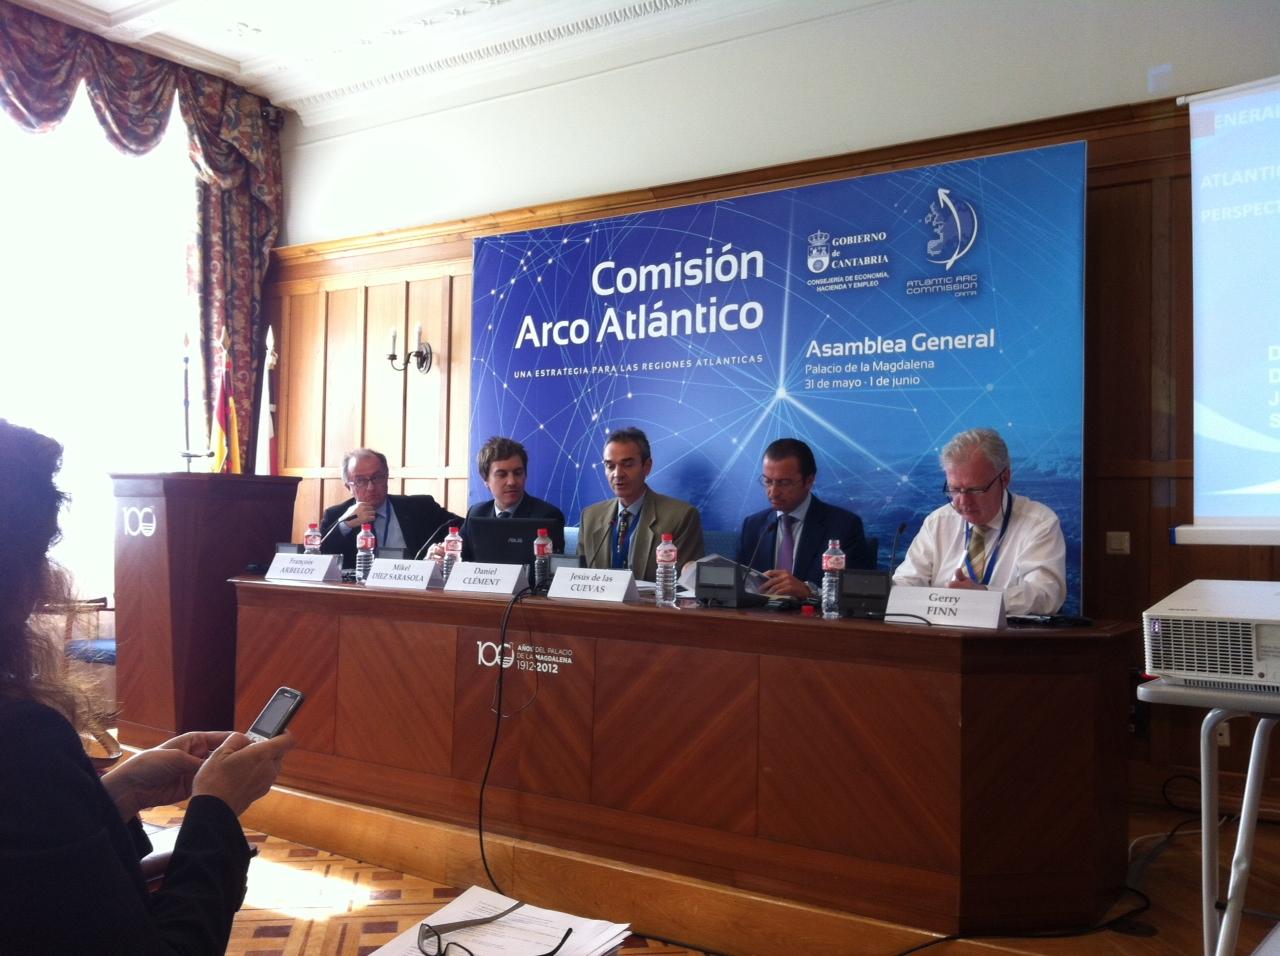 comision_arco_atlantico.jpg